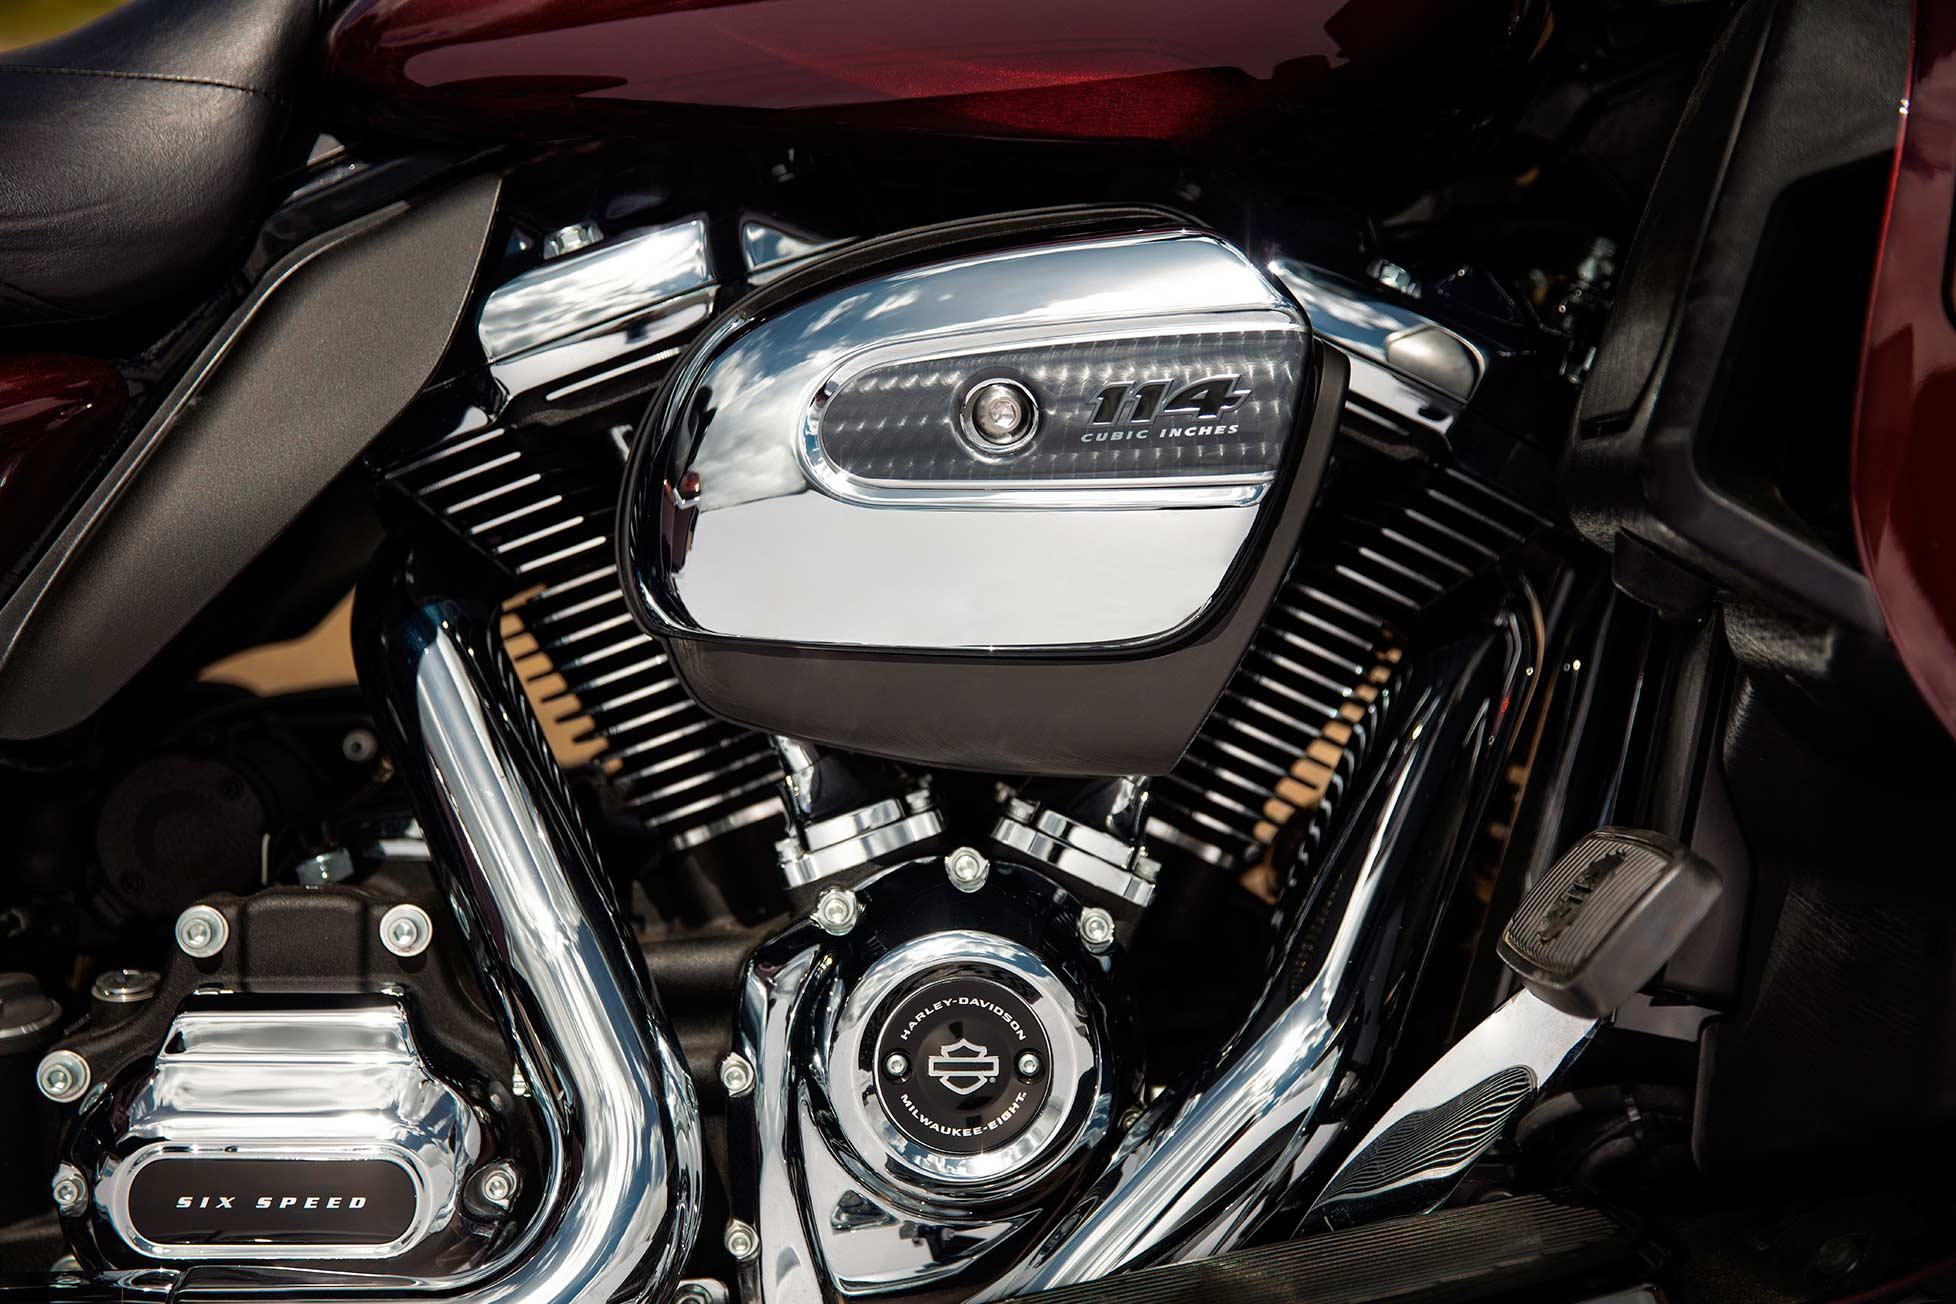 Autostar Harley Davidson